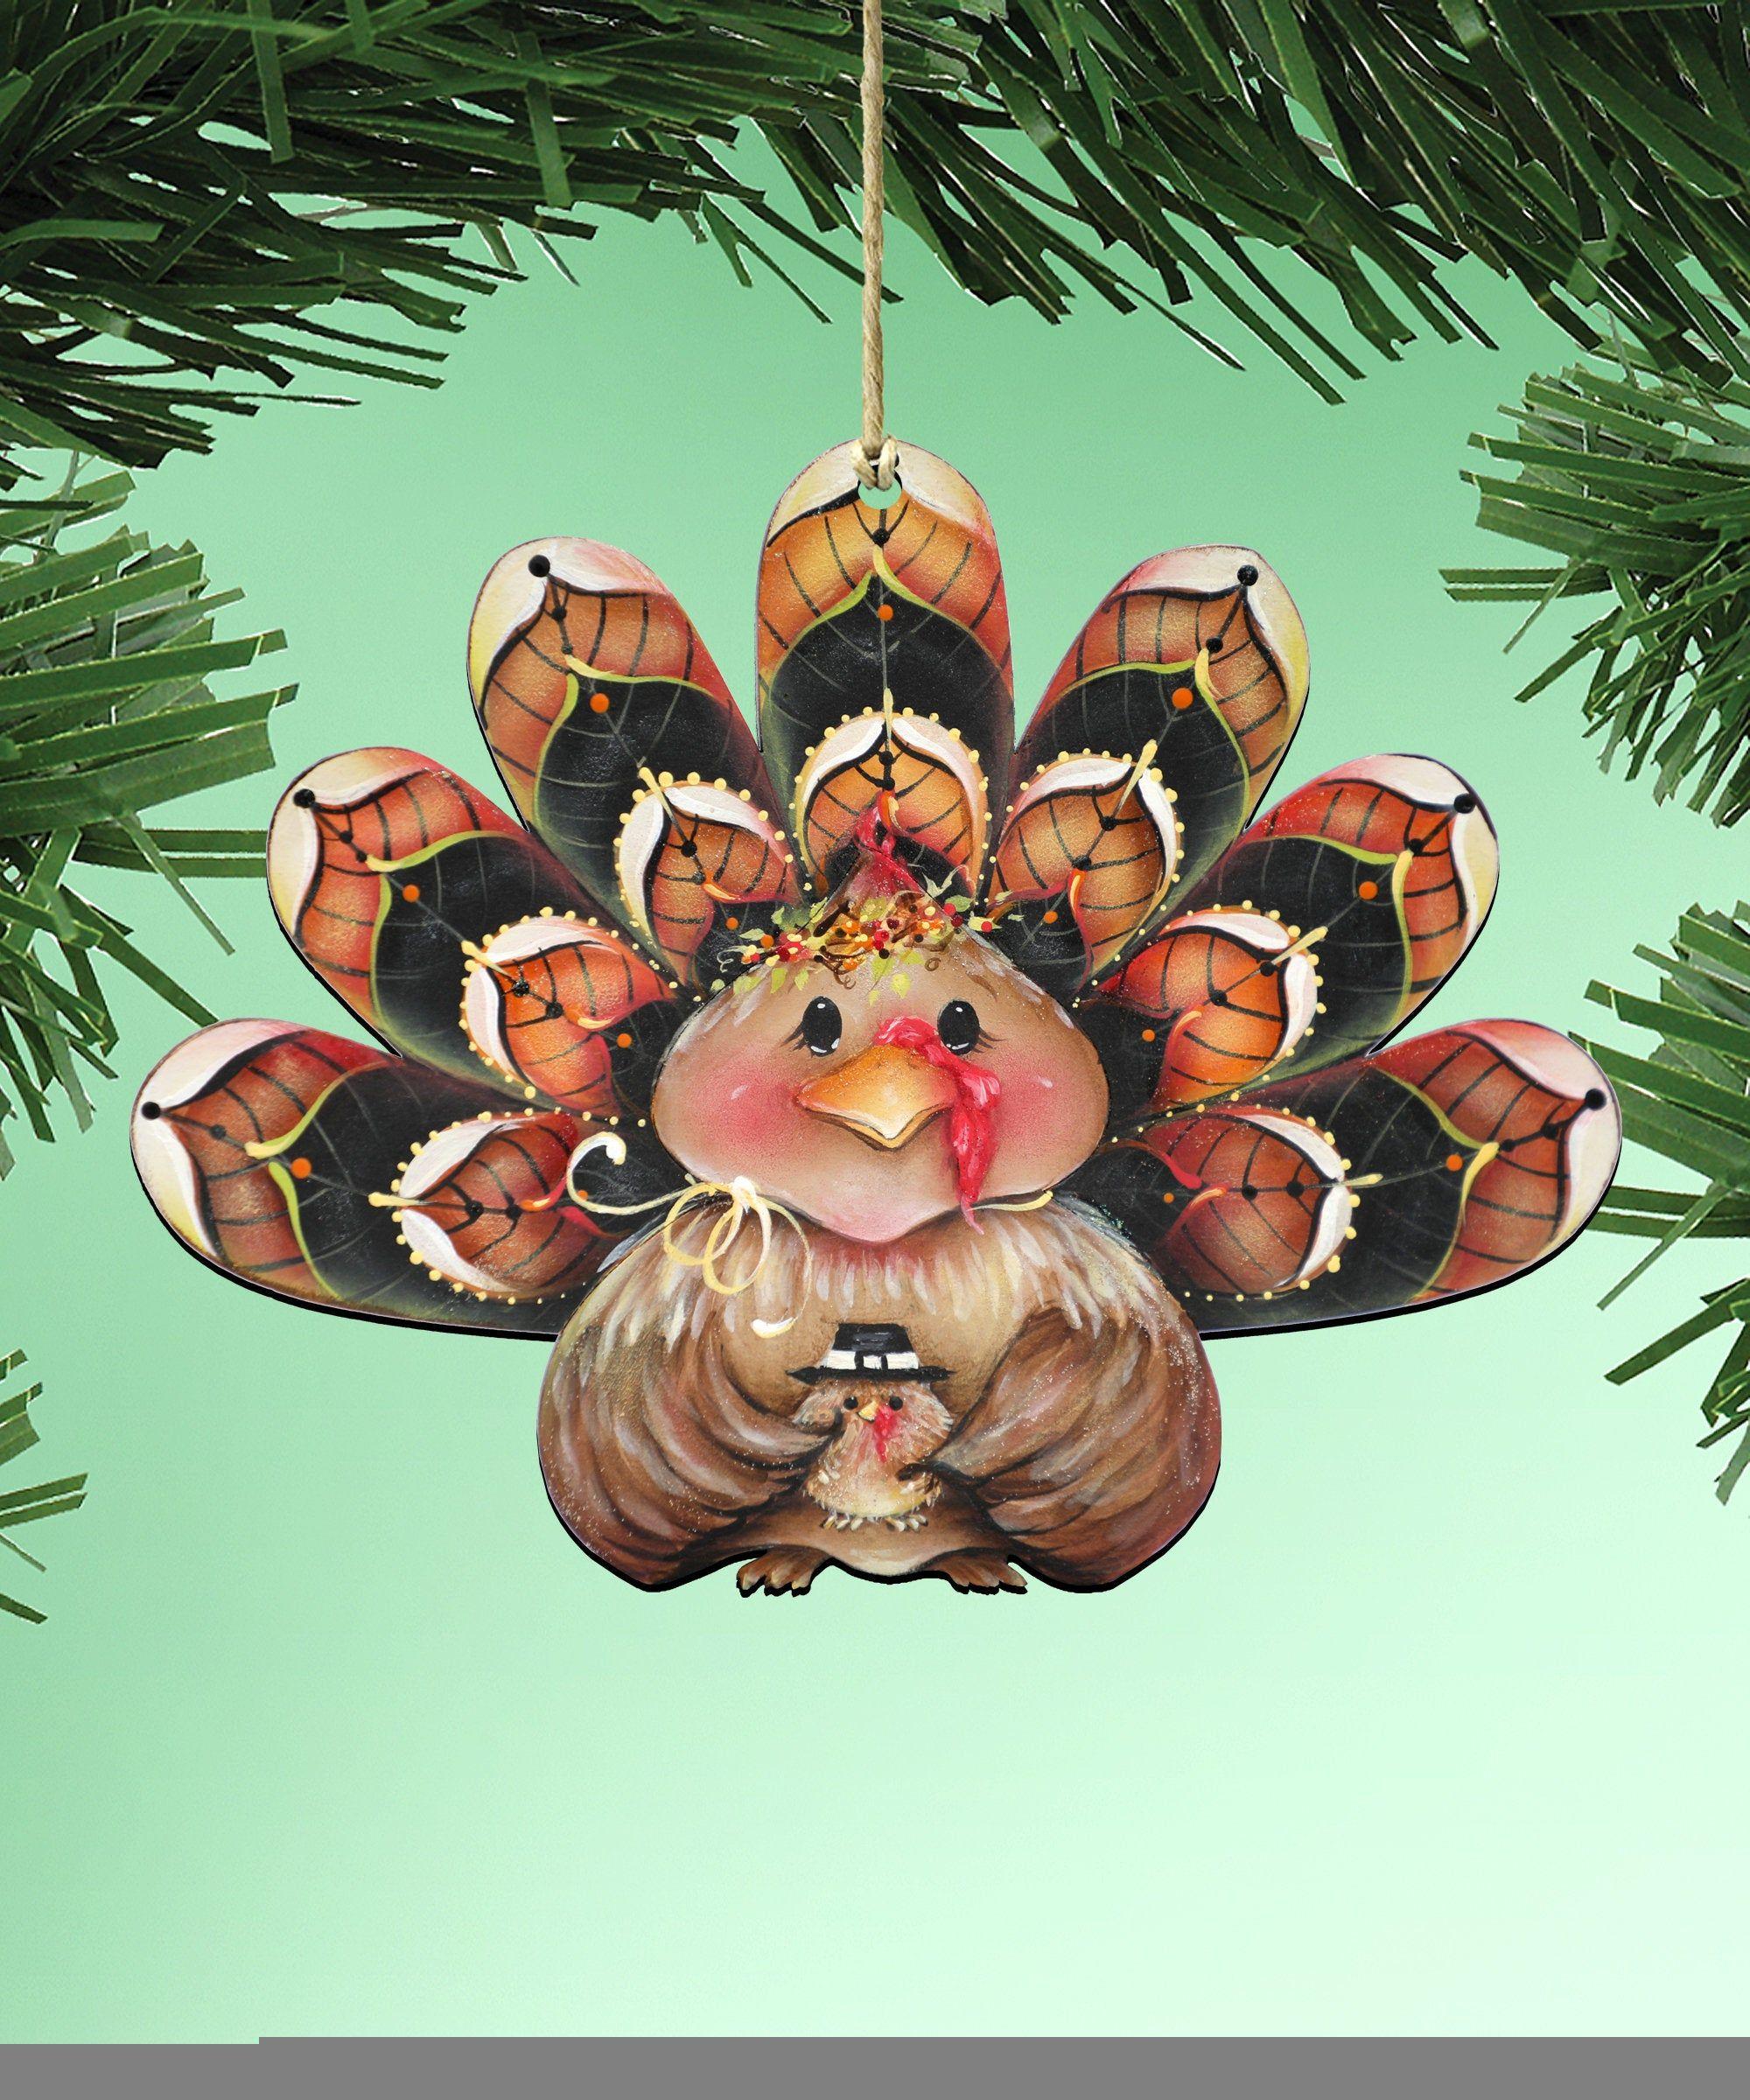 Turkey Ornament Christmas ornaments Turkey Holiday